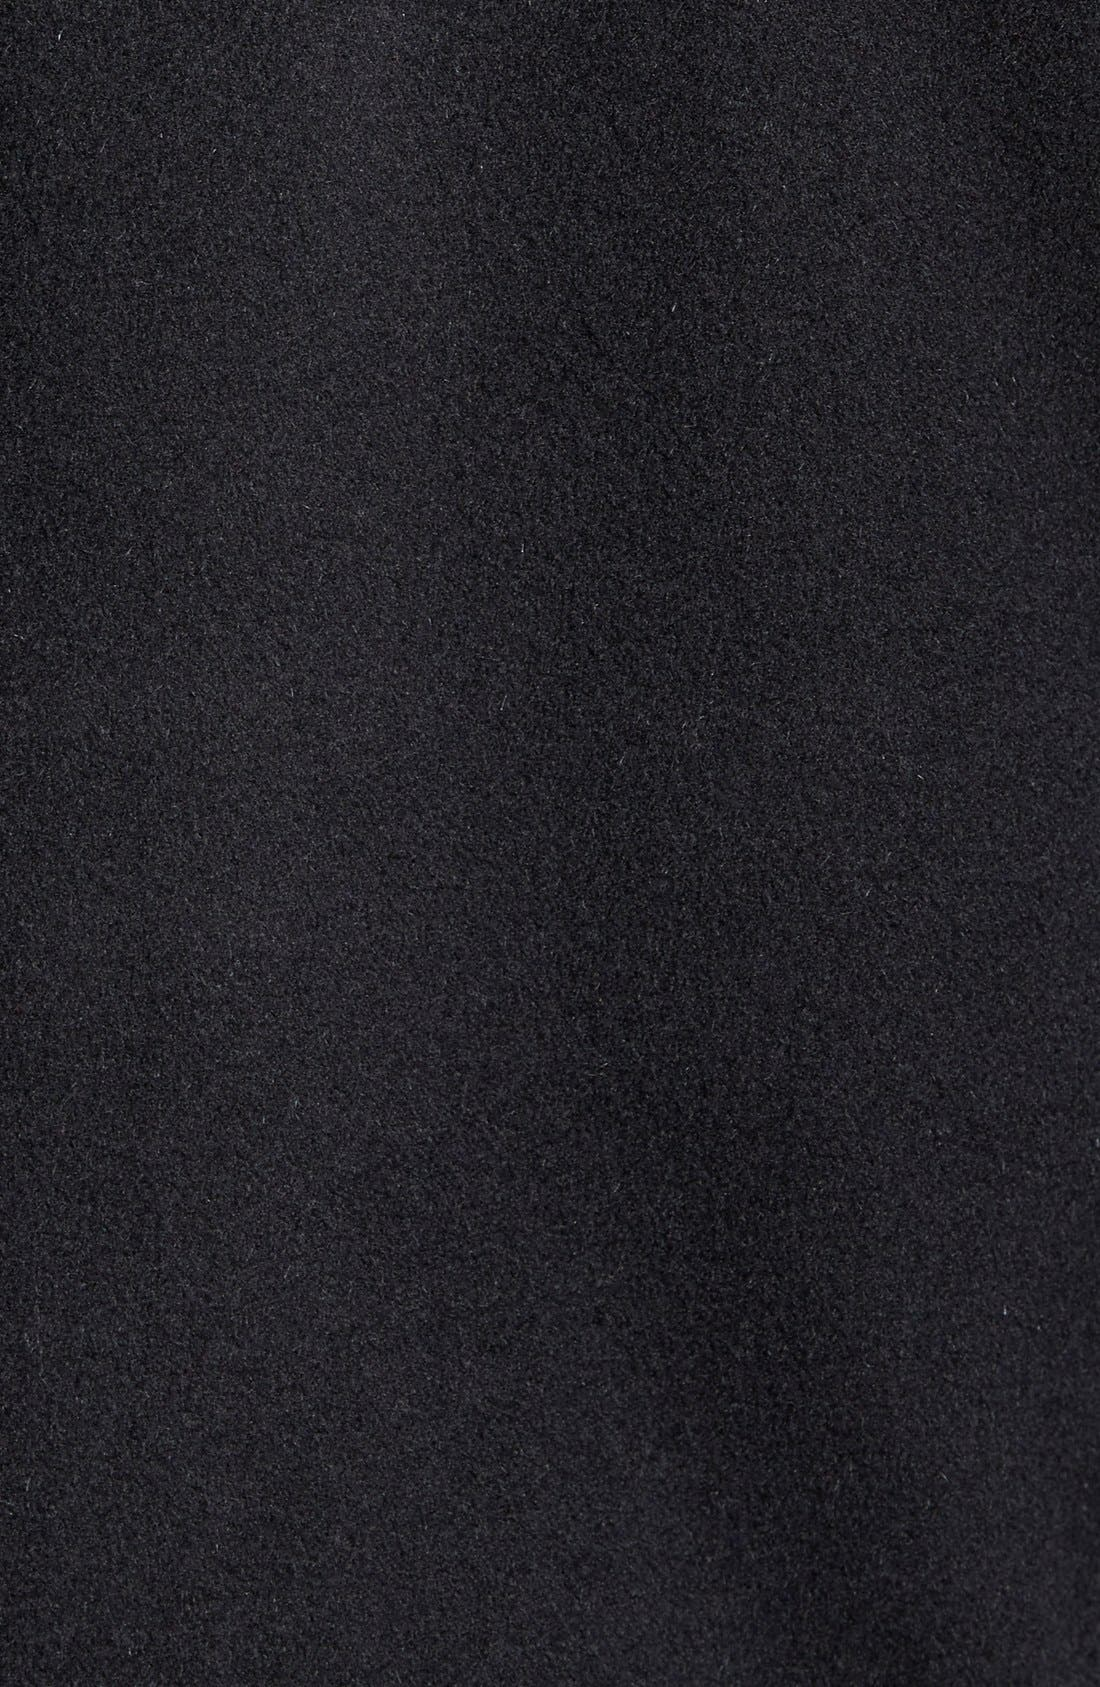 Douglas Modern Fit Wool & Cashmere Overcoat,                             Alternate thumbnail 13, color,